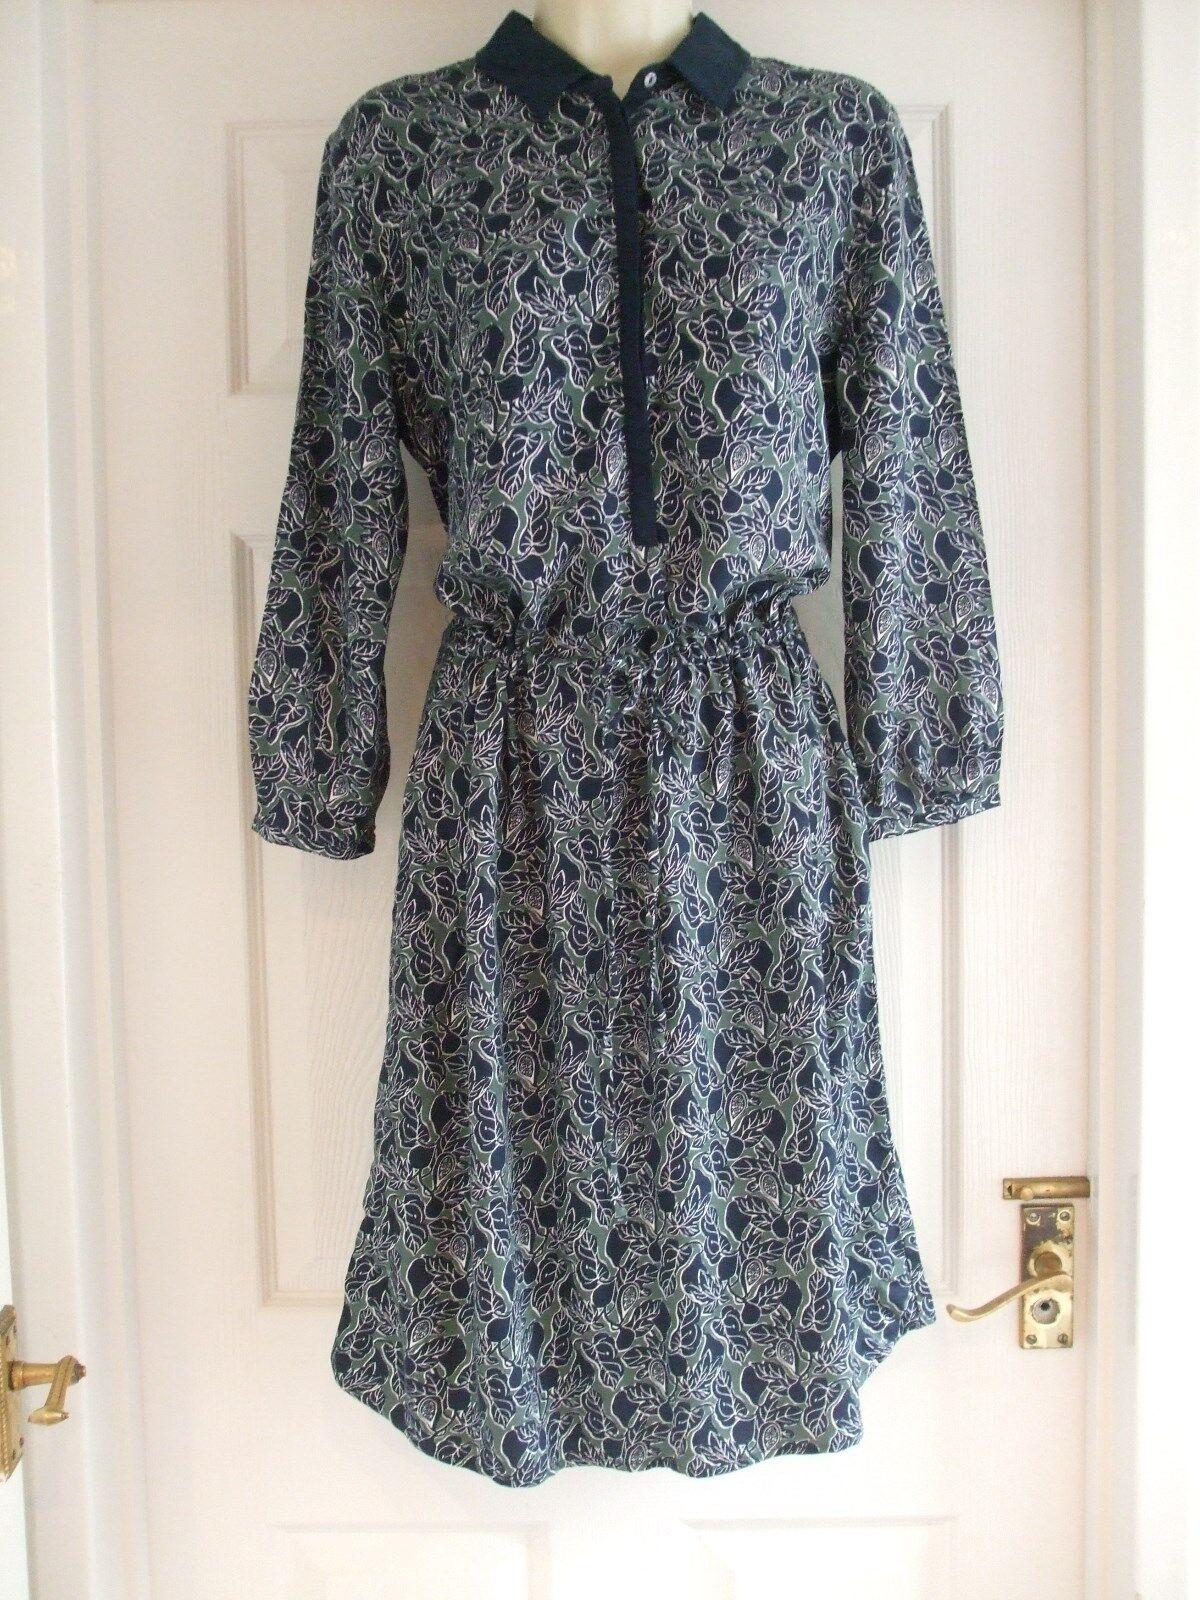 Z Womens size 12 LILLIAN DRESS blueE Work Collared Ladies Smart Summer EVENING